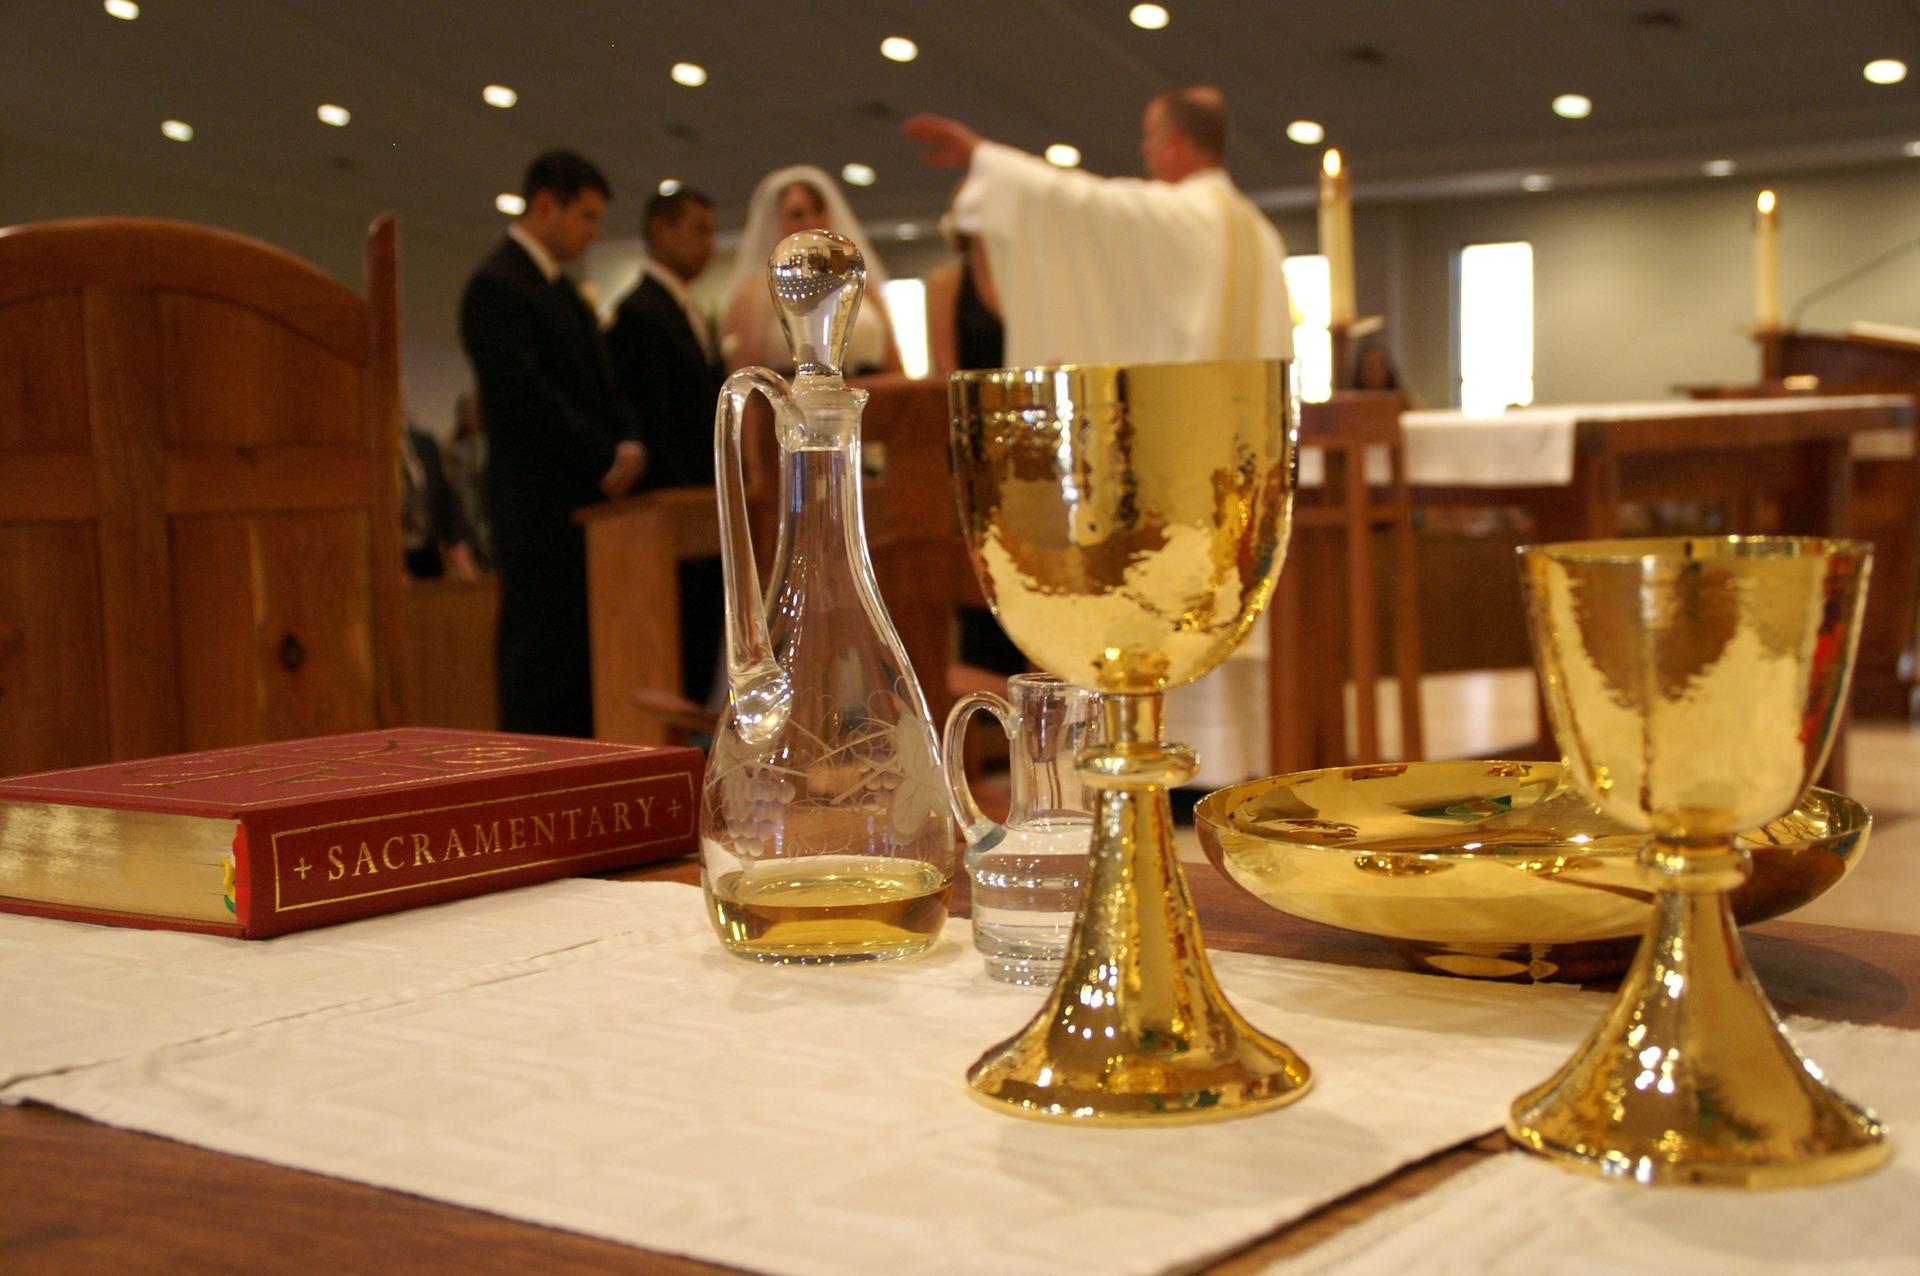 sacrament-338987_1920